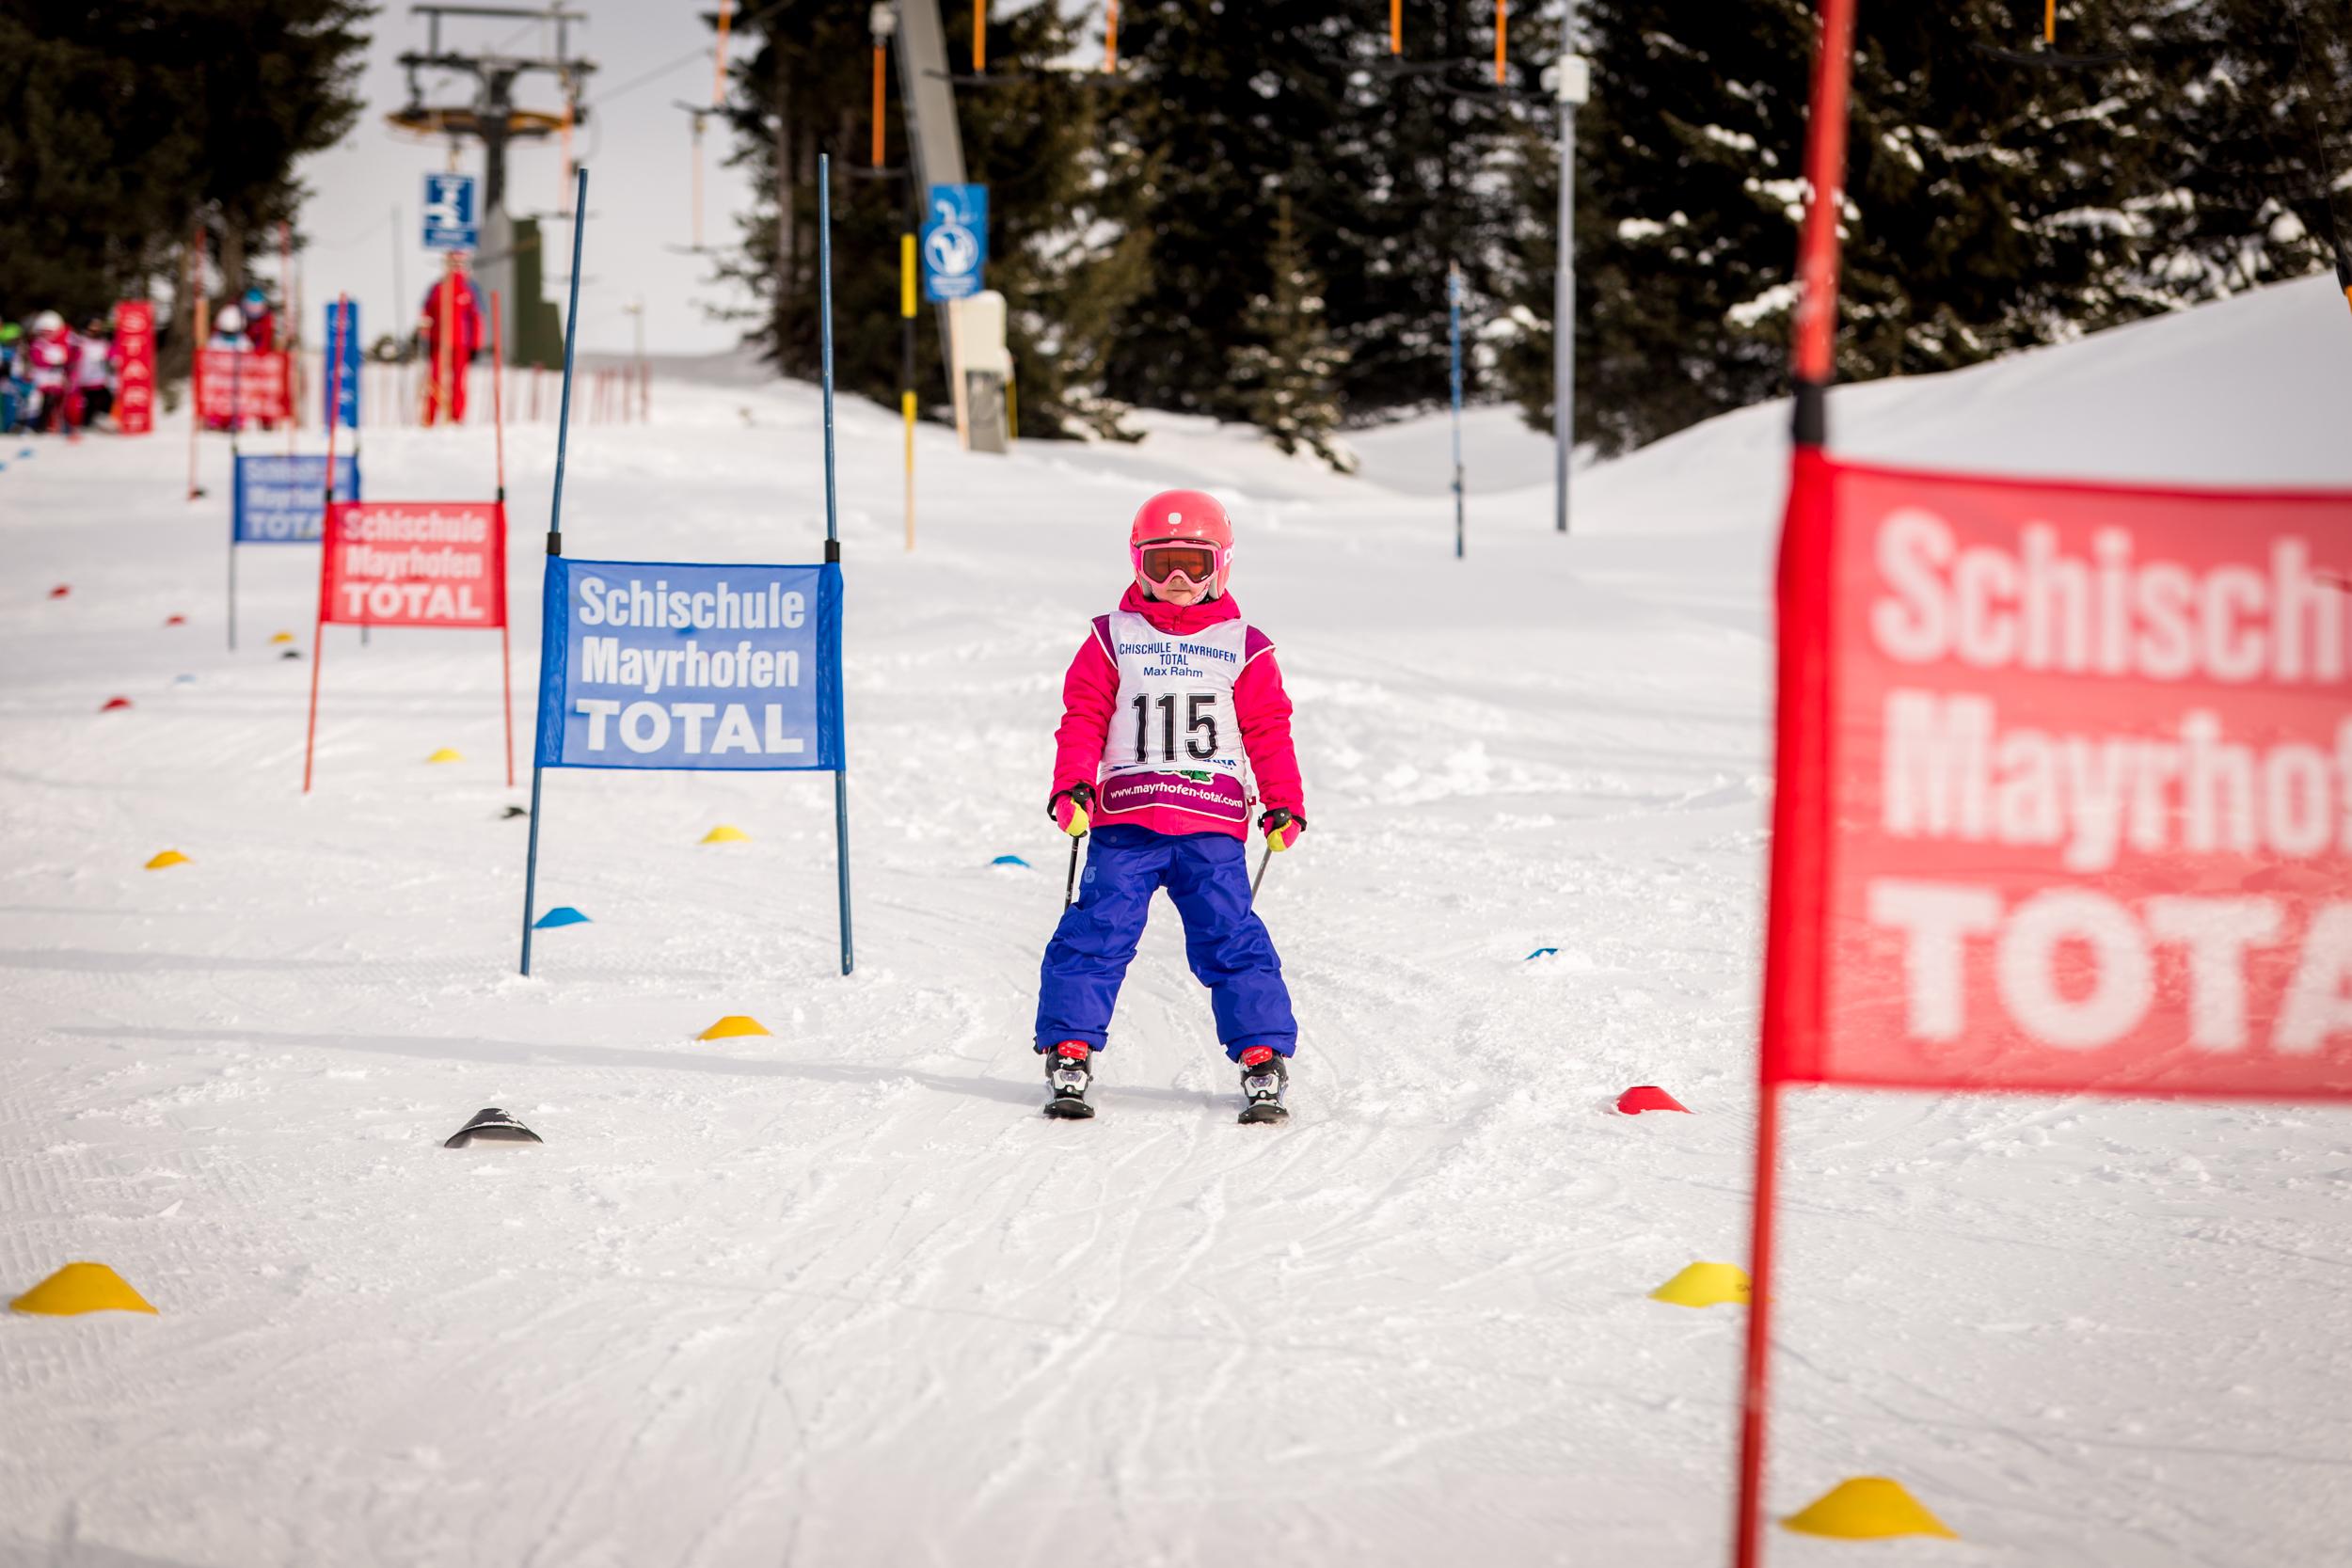 ski race 16_0048.jpg